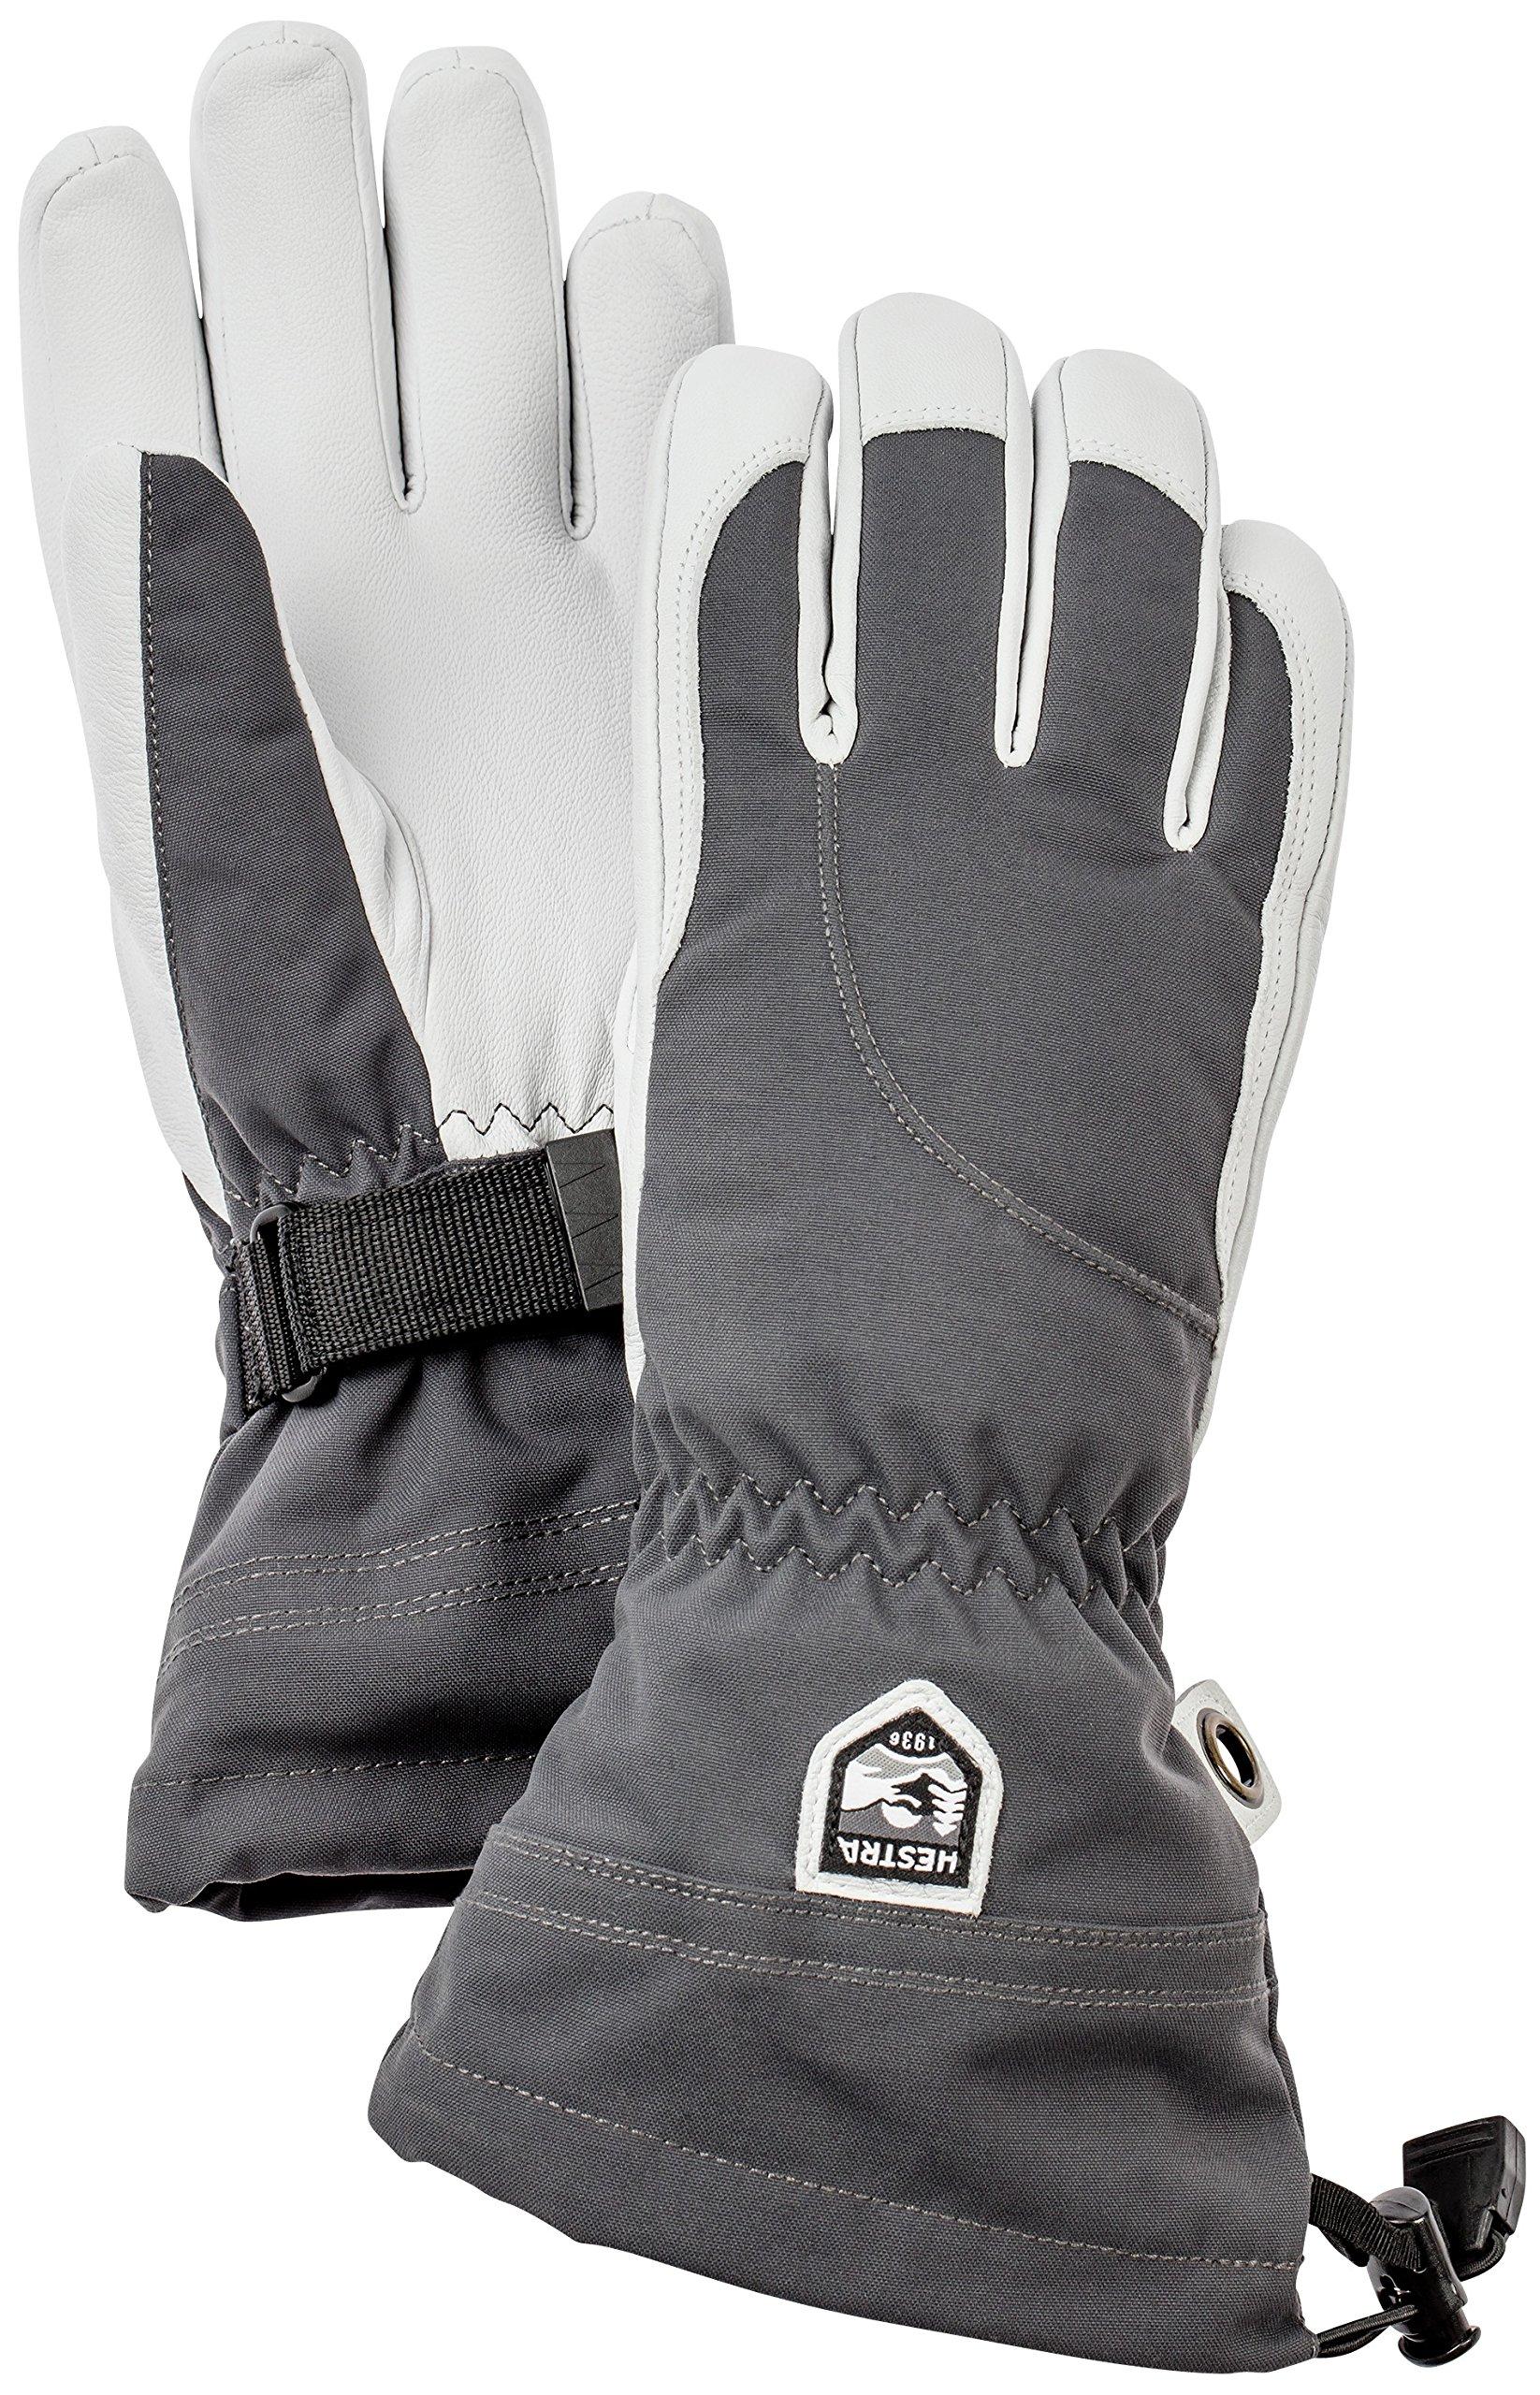 Hestra Women's Heli Gloves, Grey, Size 7